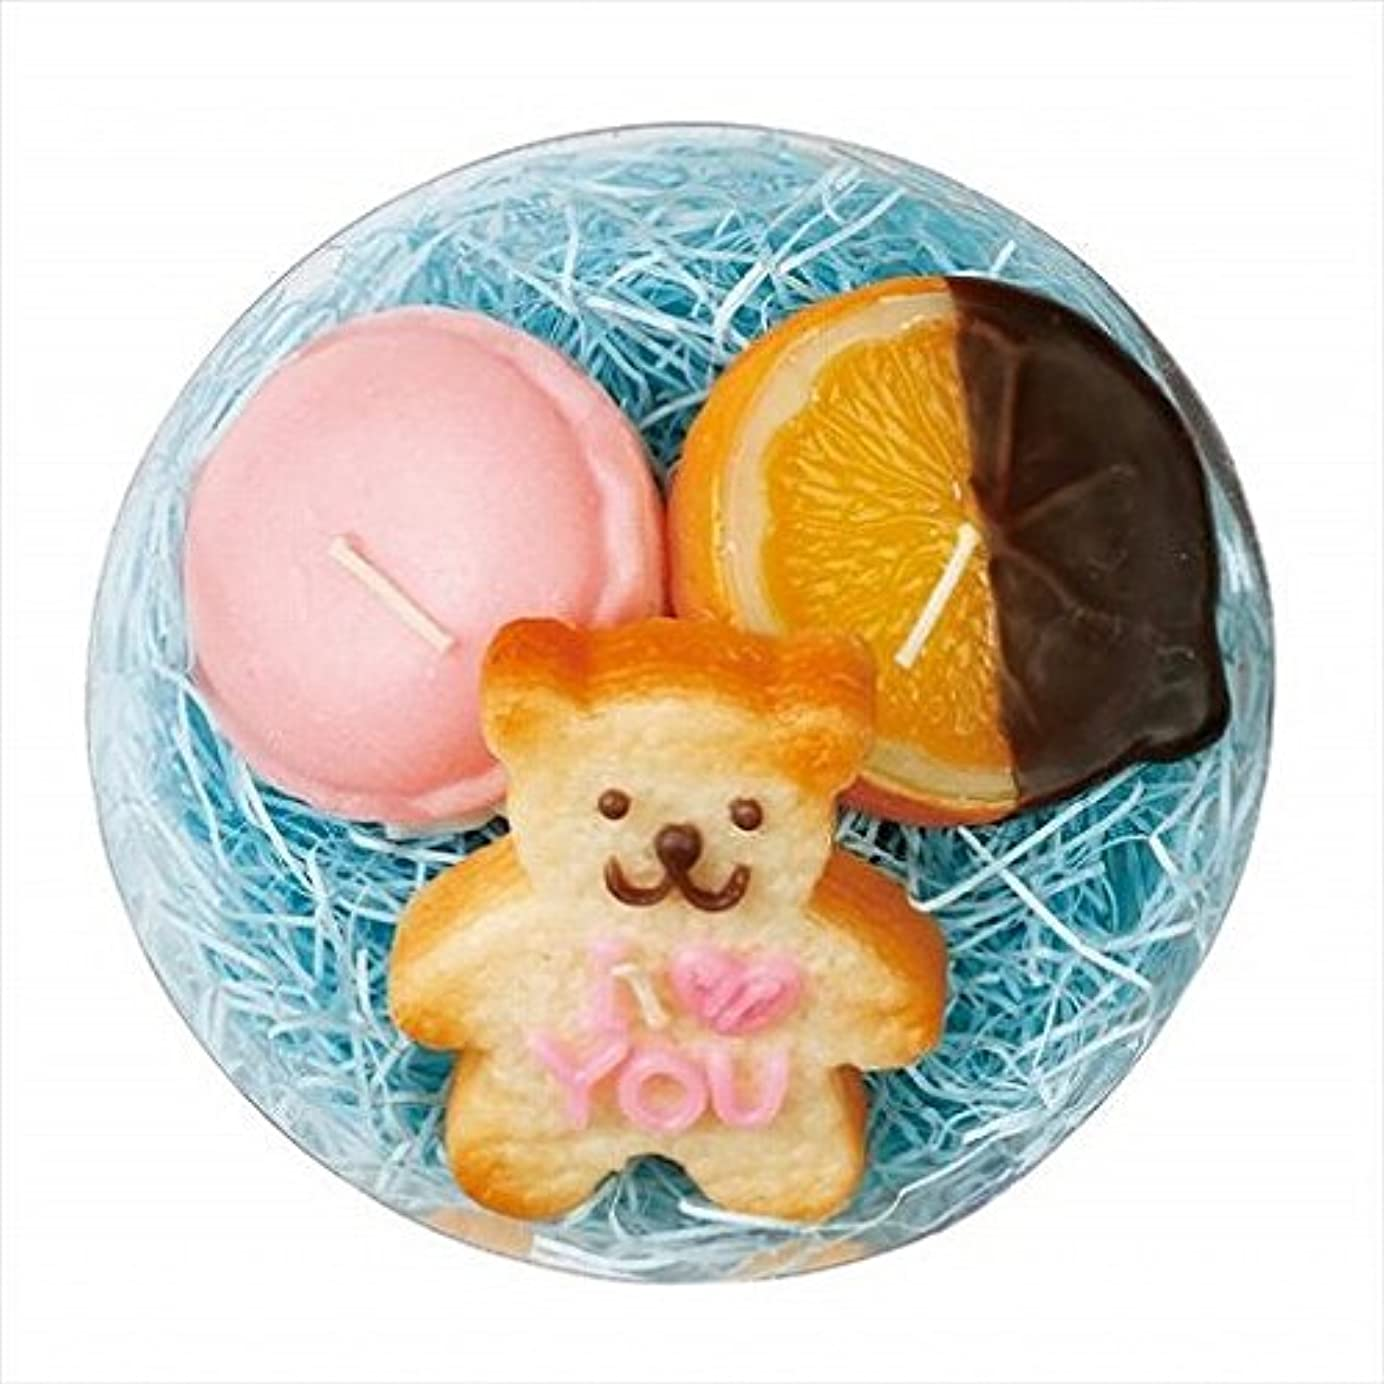 sweets candle(スイーツキャンドル) プチスイーツキャンドルセット 「 バニラベア 」 キャンドル 100x100x55mm (A6366020)